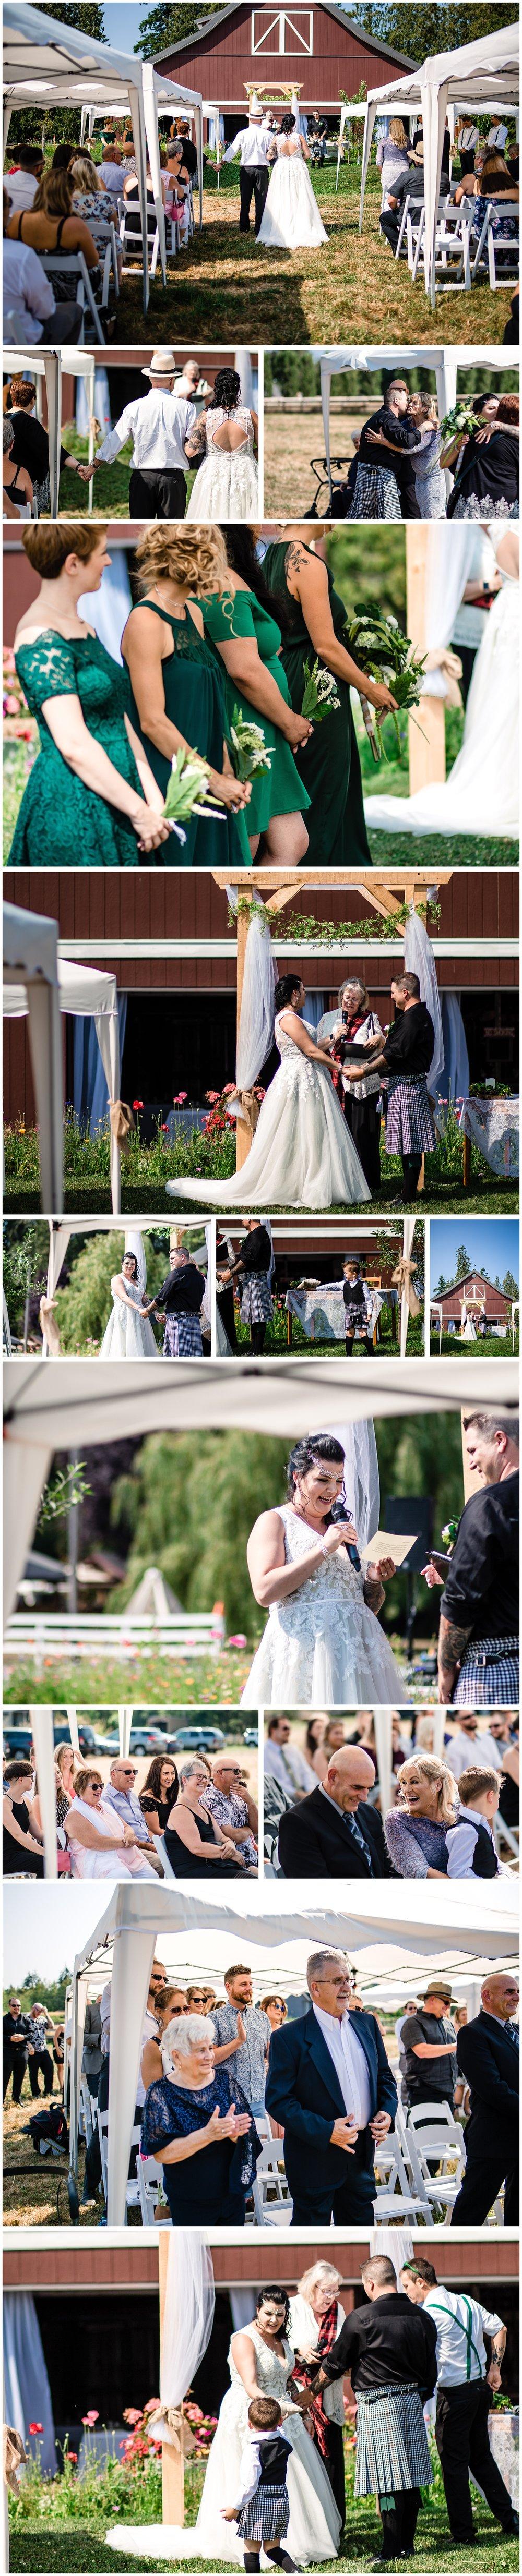 White-Owl-Barn-langley-bc-wedding-photographer-rustic-bbq-foodtruck-scottish-emerald-green-drinks_0002.jpg